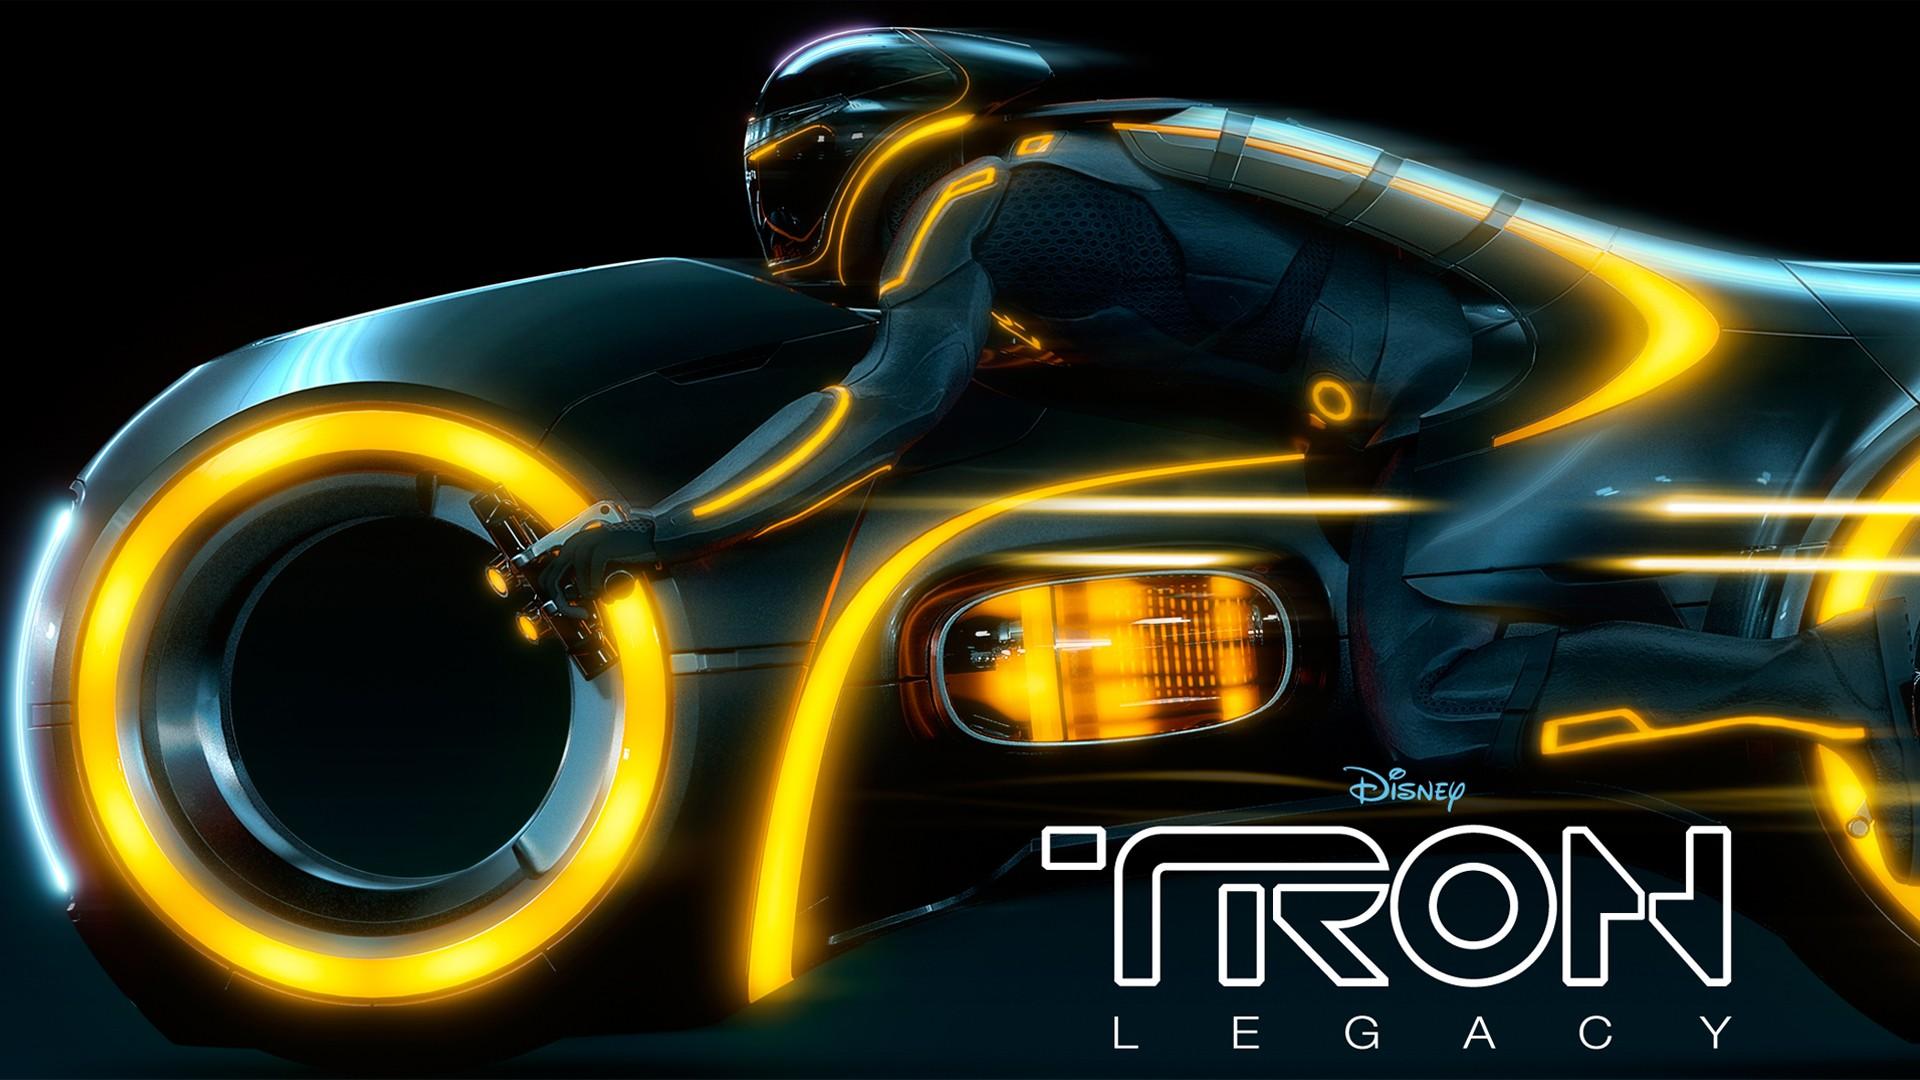 Illustration Car Vehicle Movies Light Cycle Tron Legacy Wheel Screenshot Computer Wallpaper Automotive Design Font